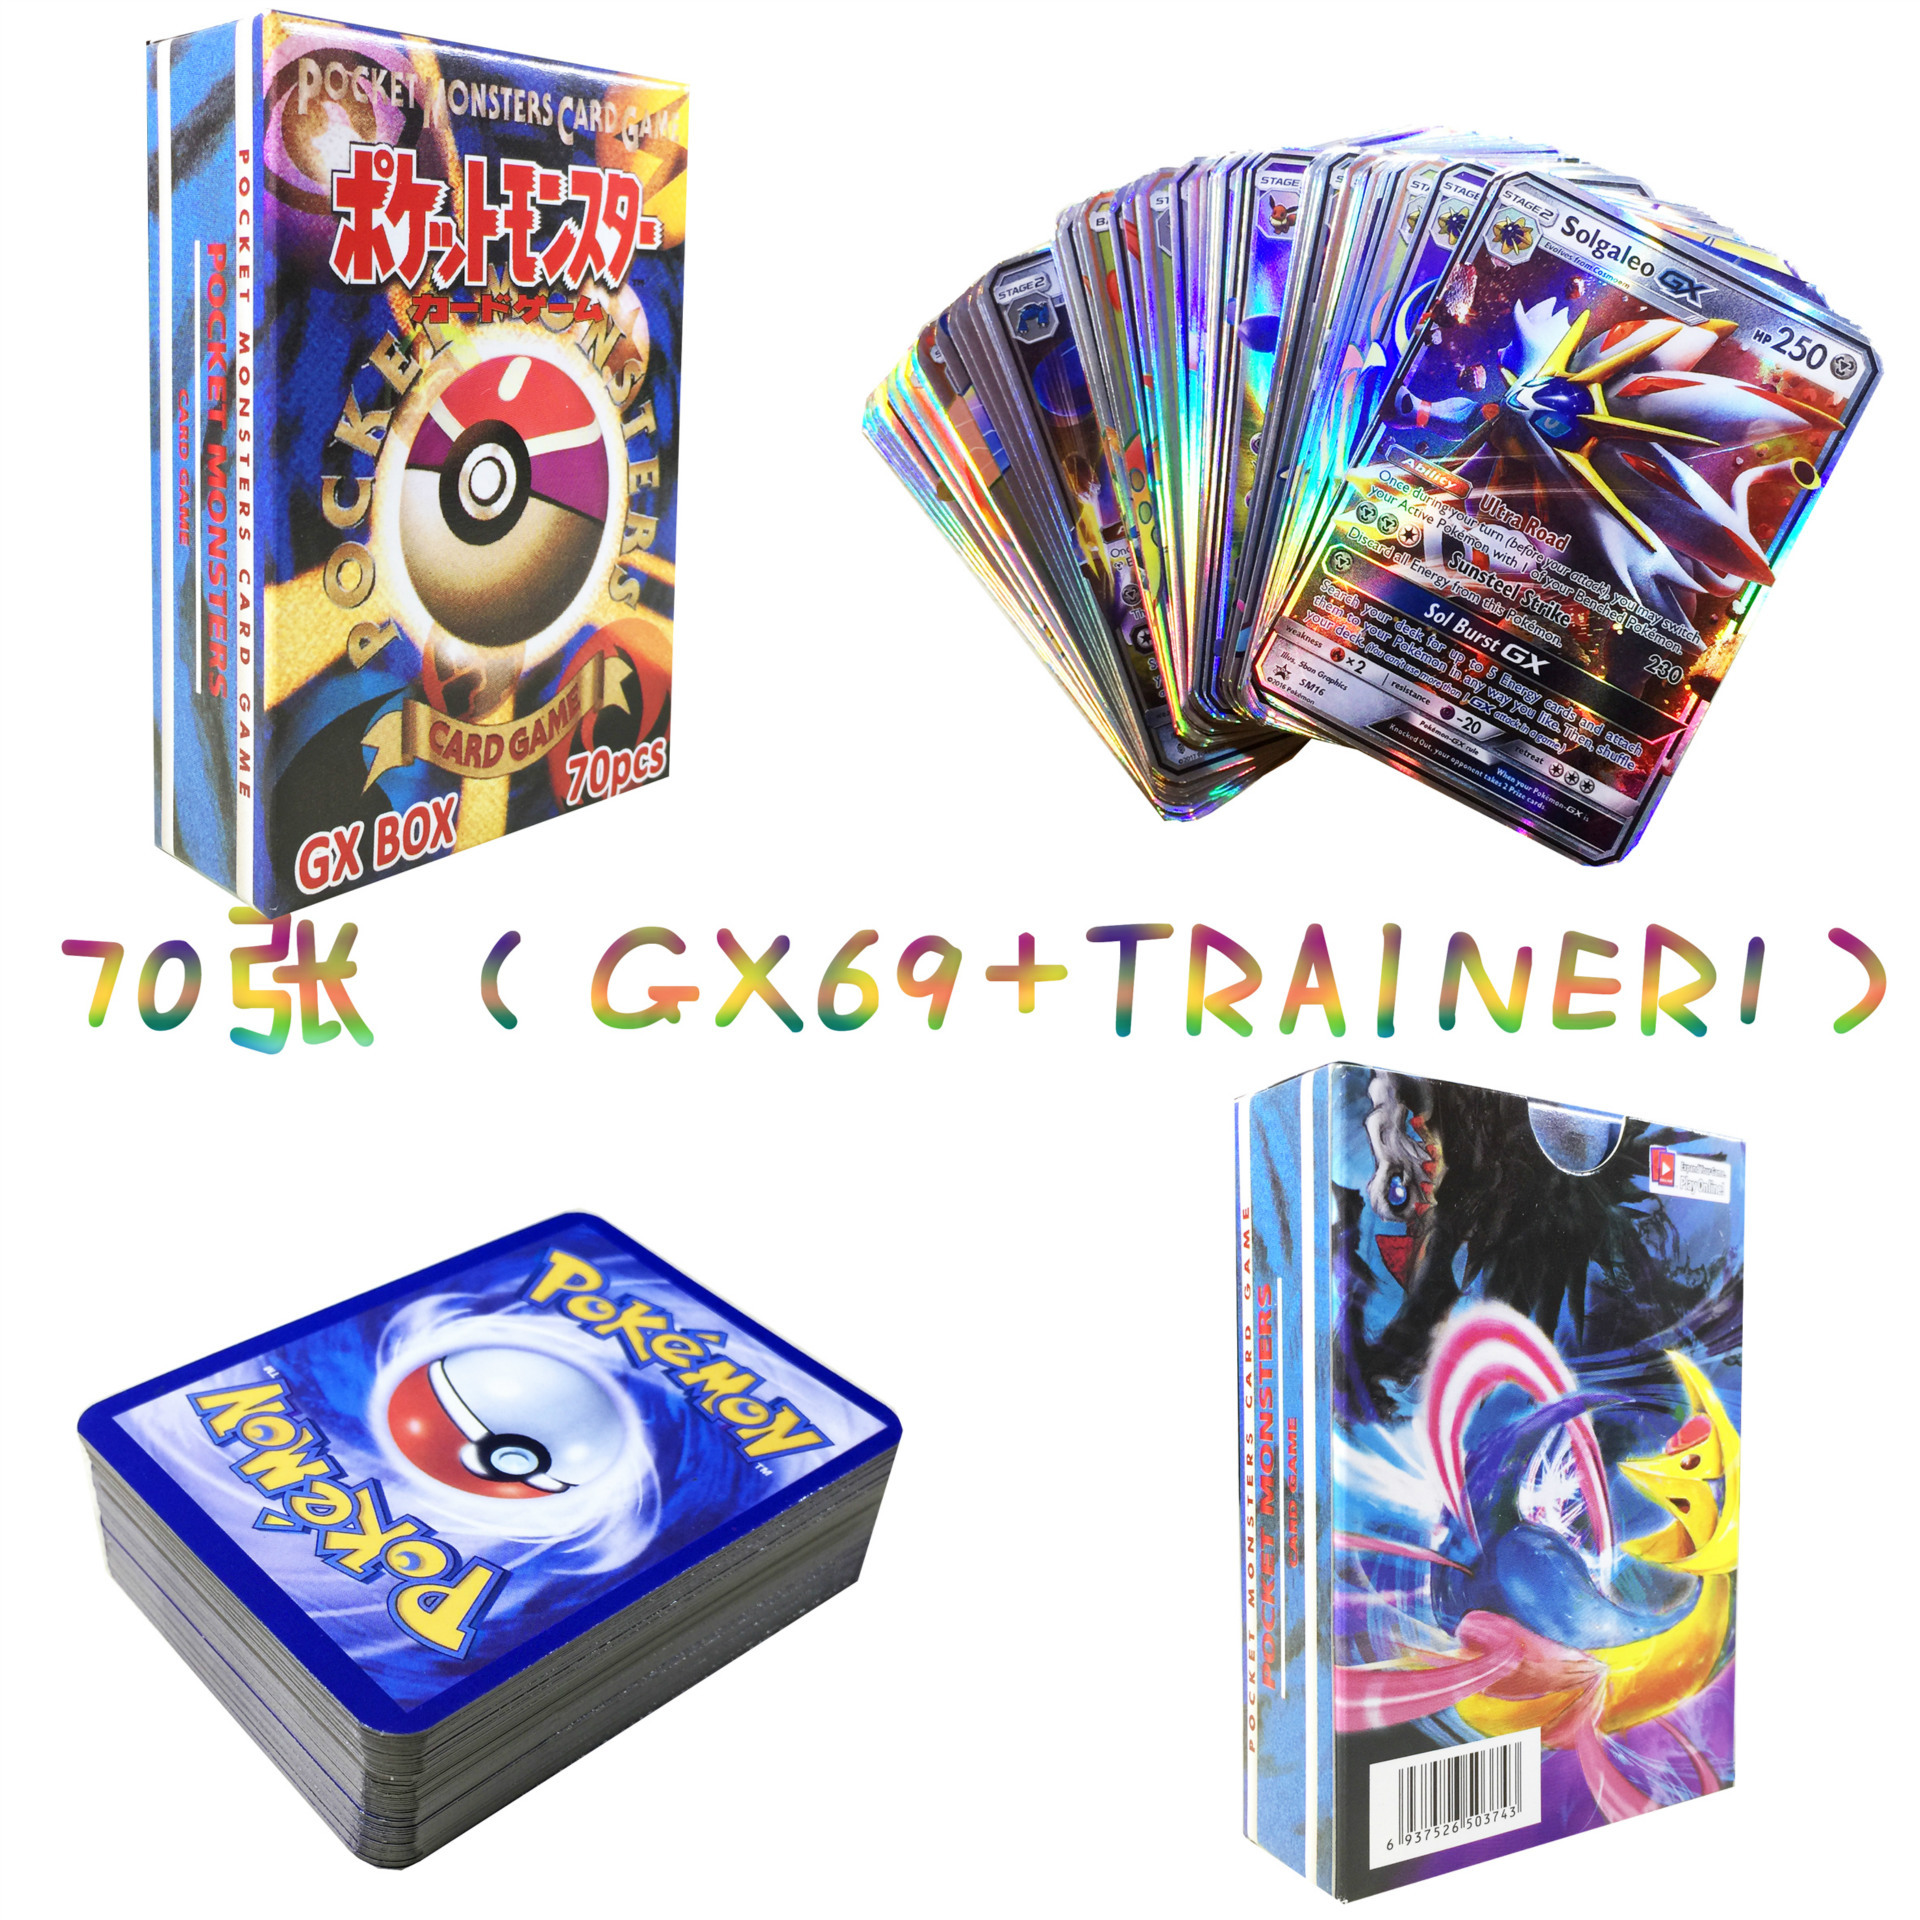 70pcs GX Flash Pokemon Cards TAKARA TOMY Pet Pokemon Cards 2019 The Newest Pokemon English Gx  Card